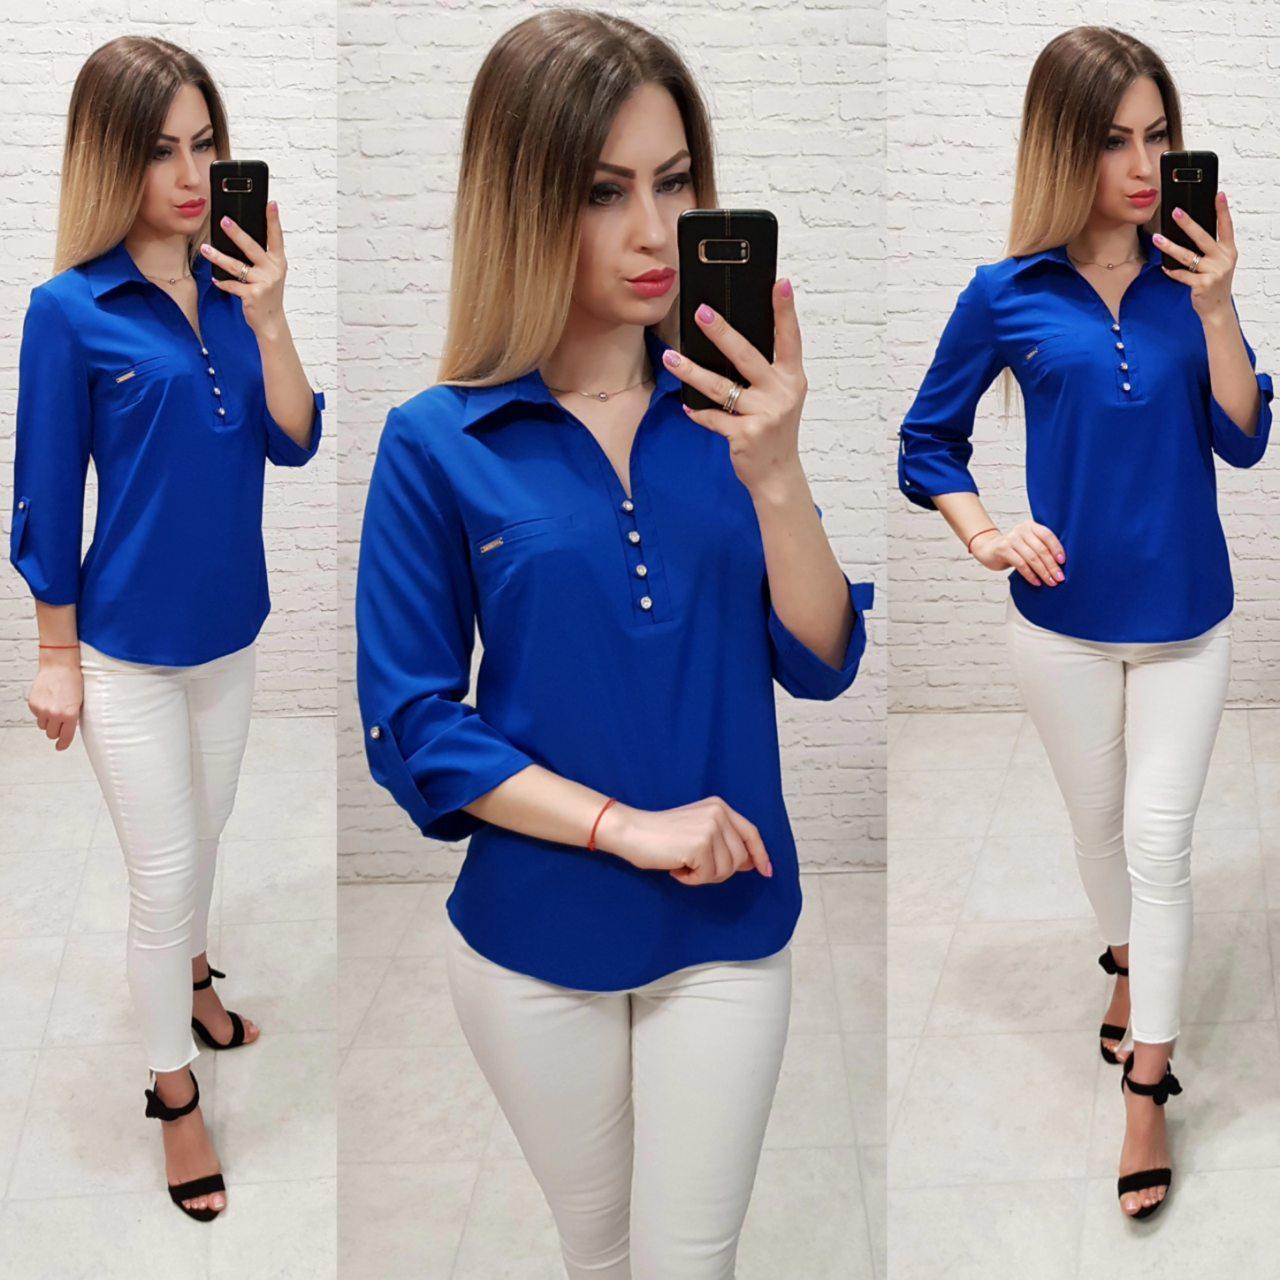 Блузка/блуза - сорочка з ґудзиками на грудях, модель 828 , колір електрик